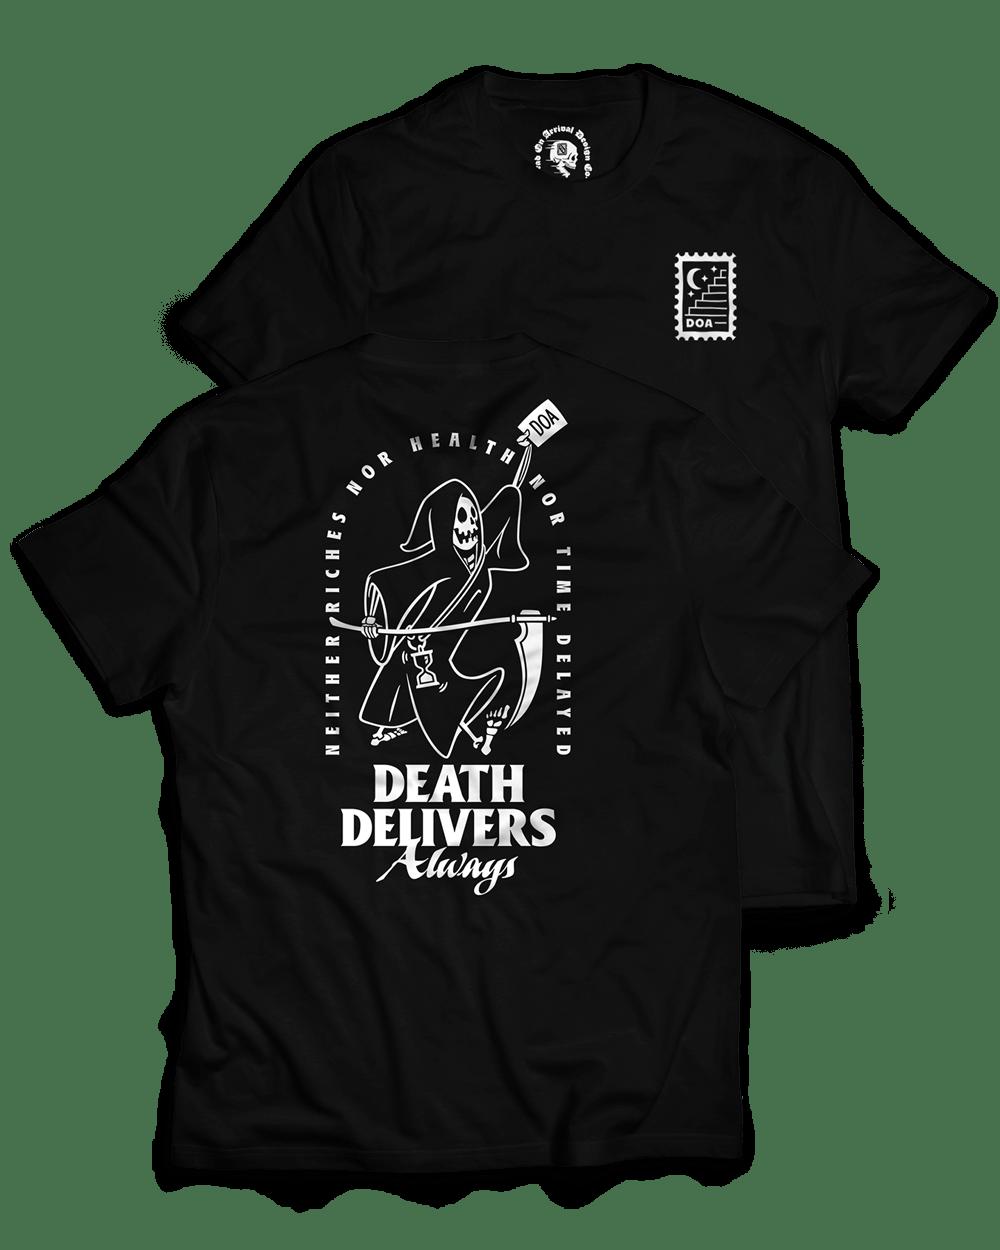 """Death Delivers"" / Graphic Tee, Black"